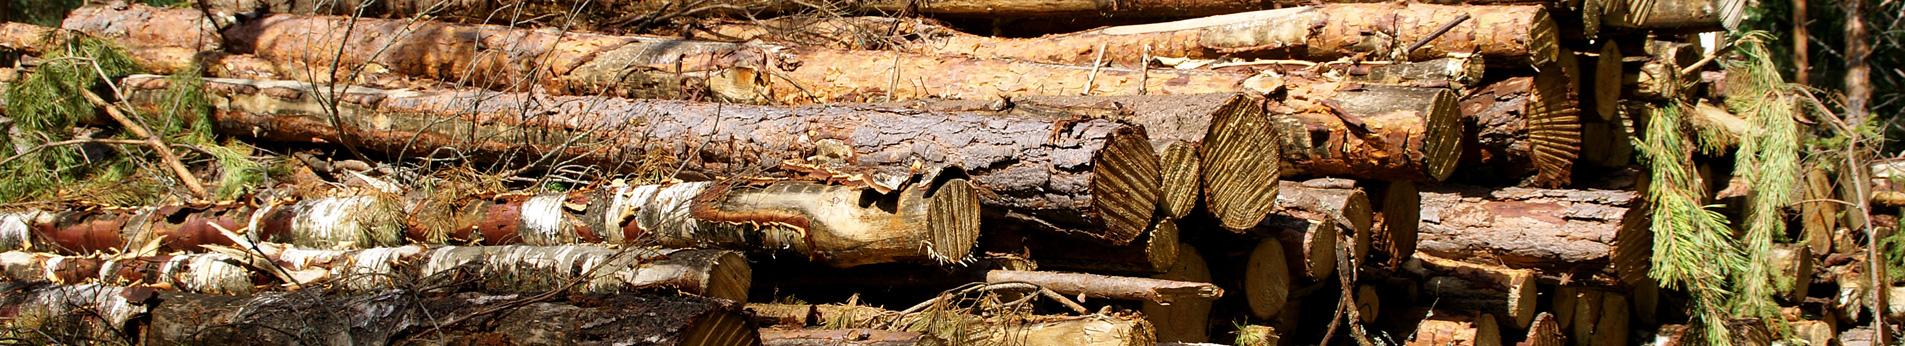 Tree Buyers | Tree Purchasing | Angola Tree Harvesting